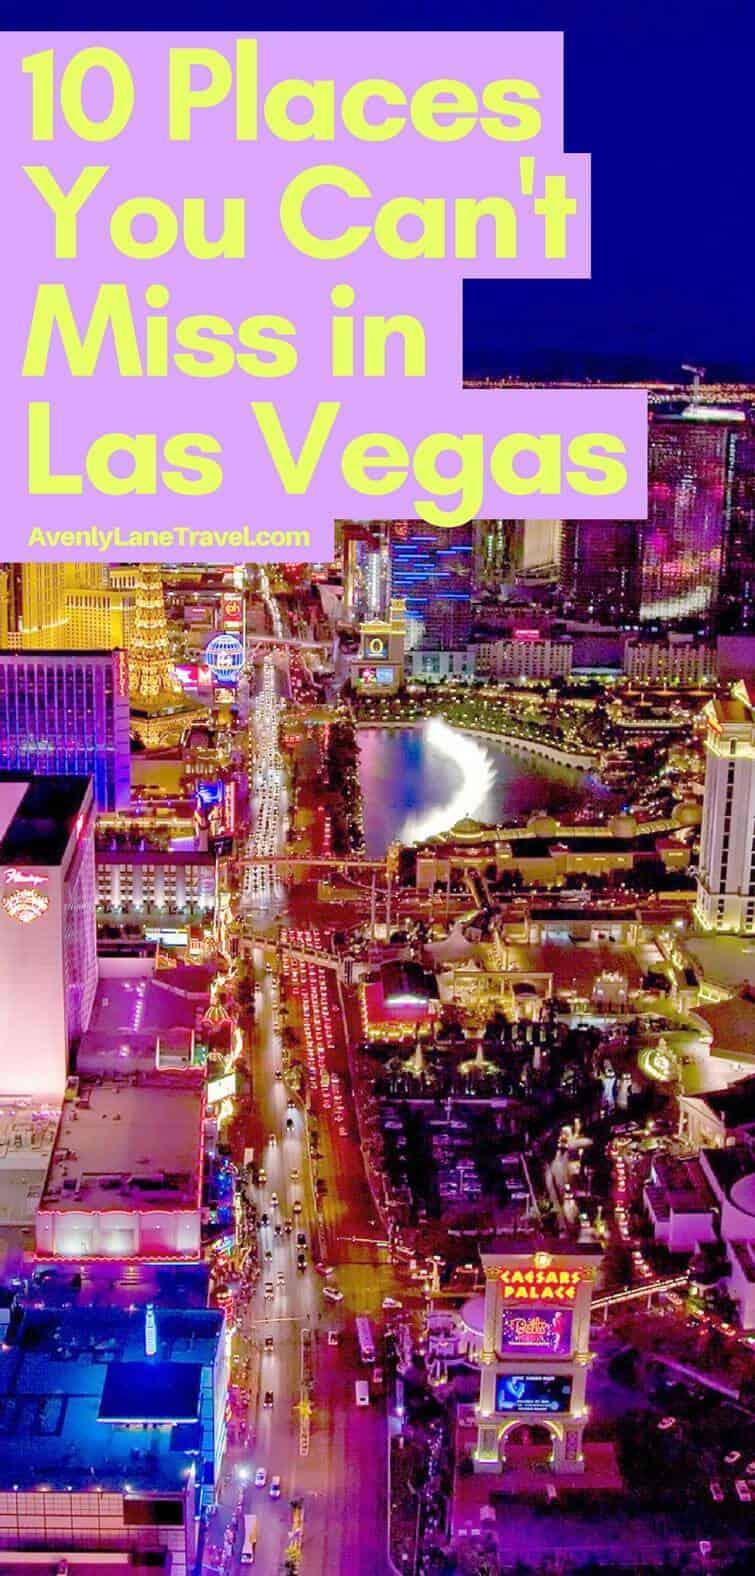 Las Vegas Strip! See the top 10 things to do in Las Vegas, Nevada.